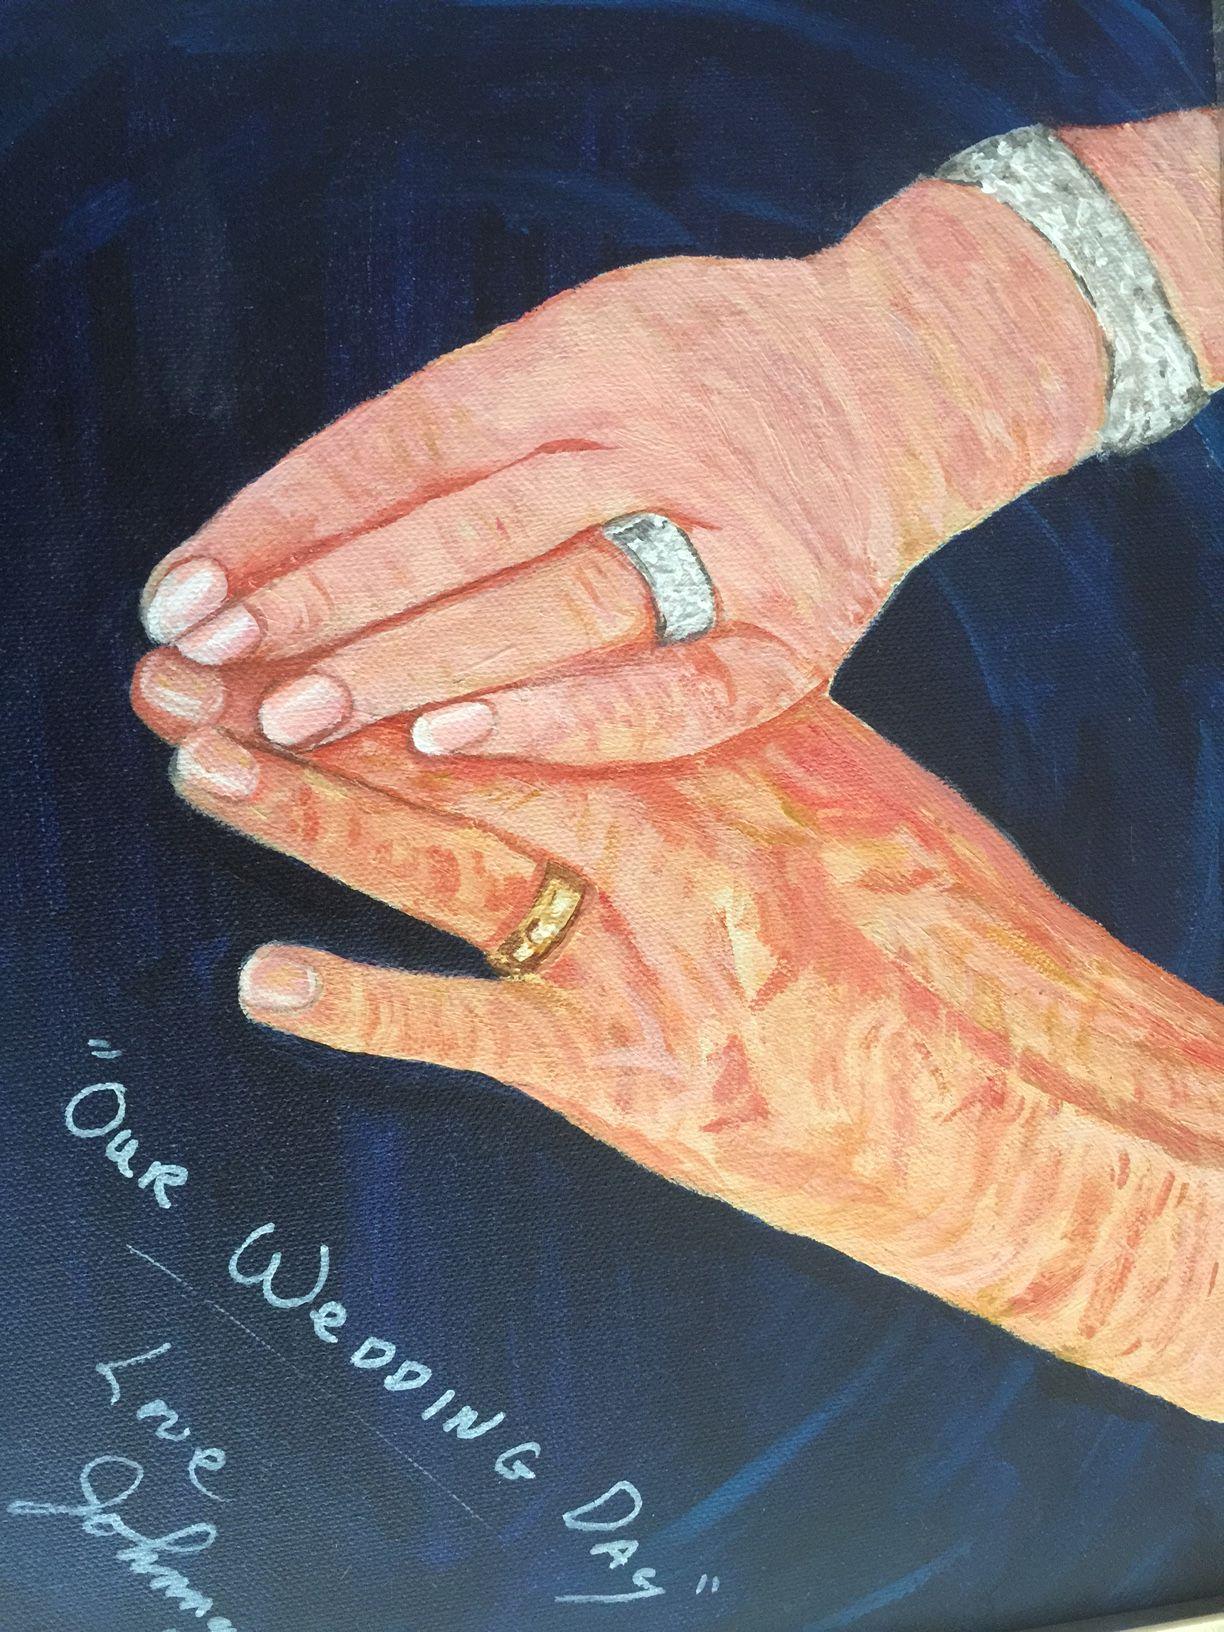 A wedding present to my wife - John-Norman Tuck